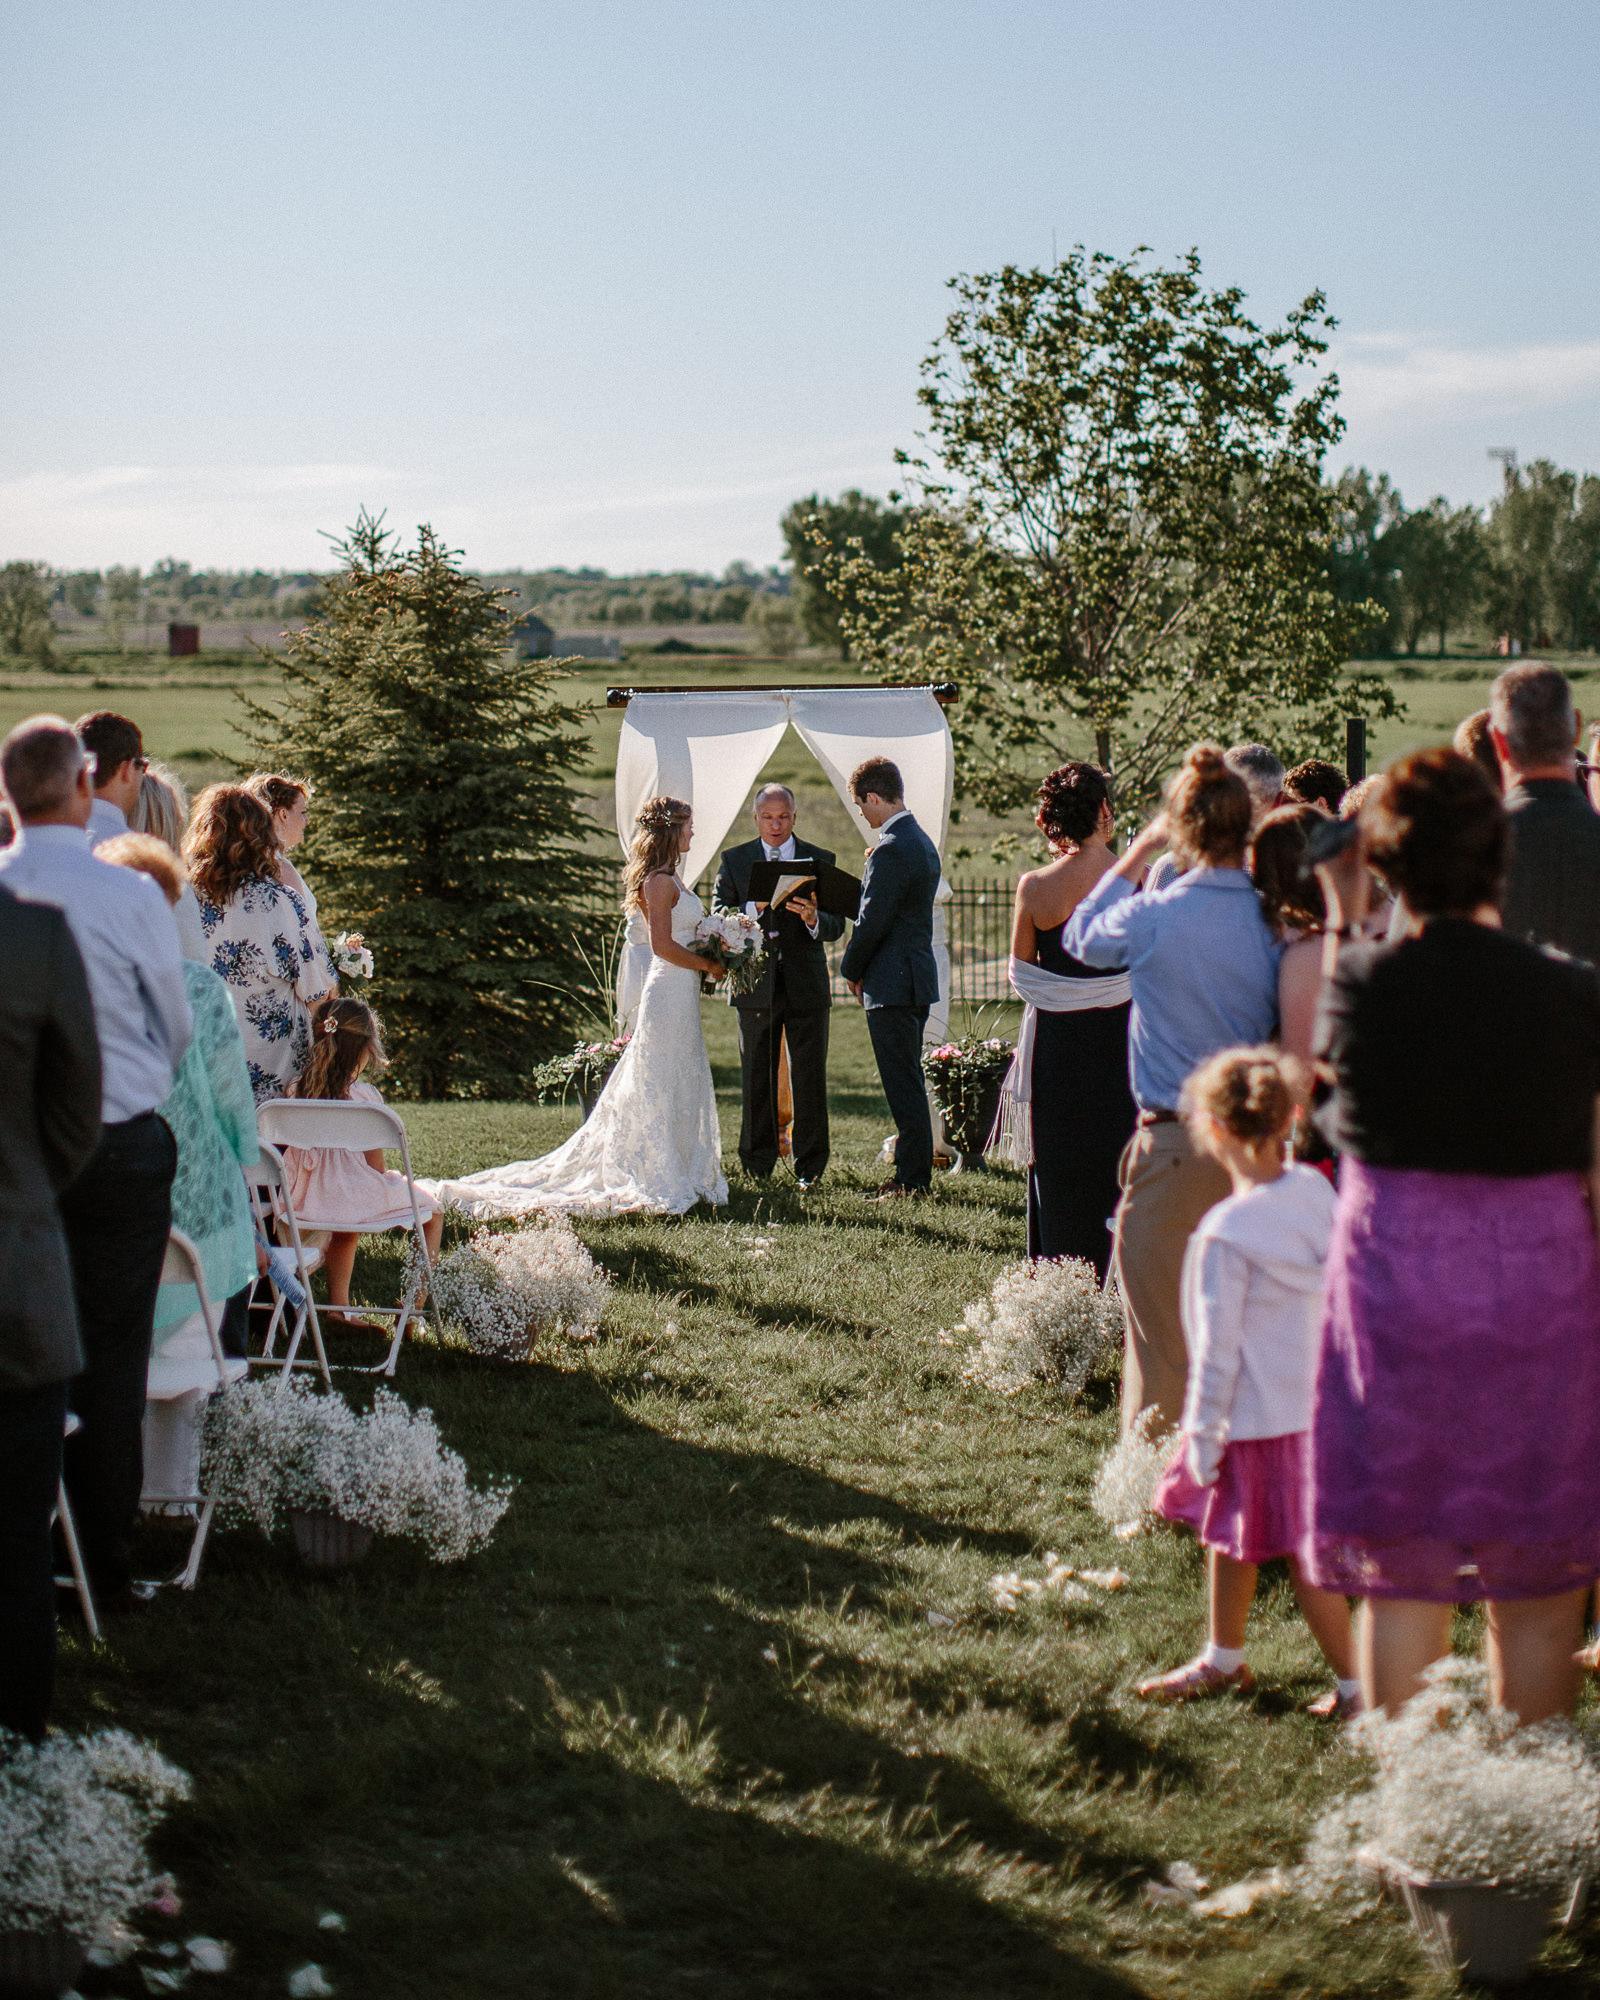 wedding-elopement-adventerous-romantic-timeless-south-dakota-blue-haven-barn-040.jpg